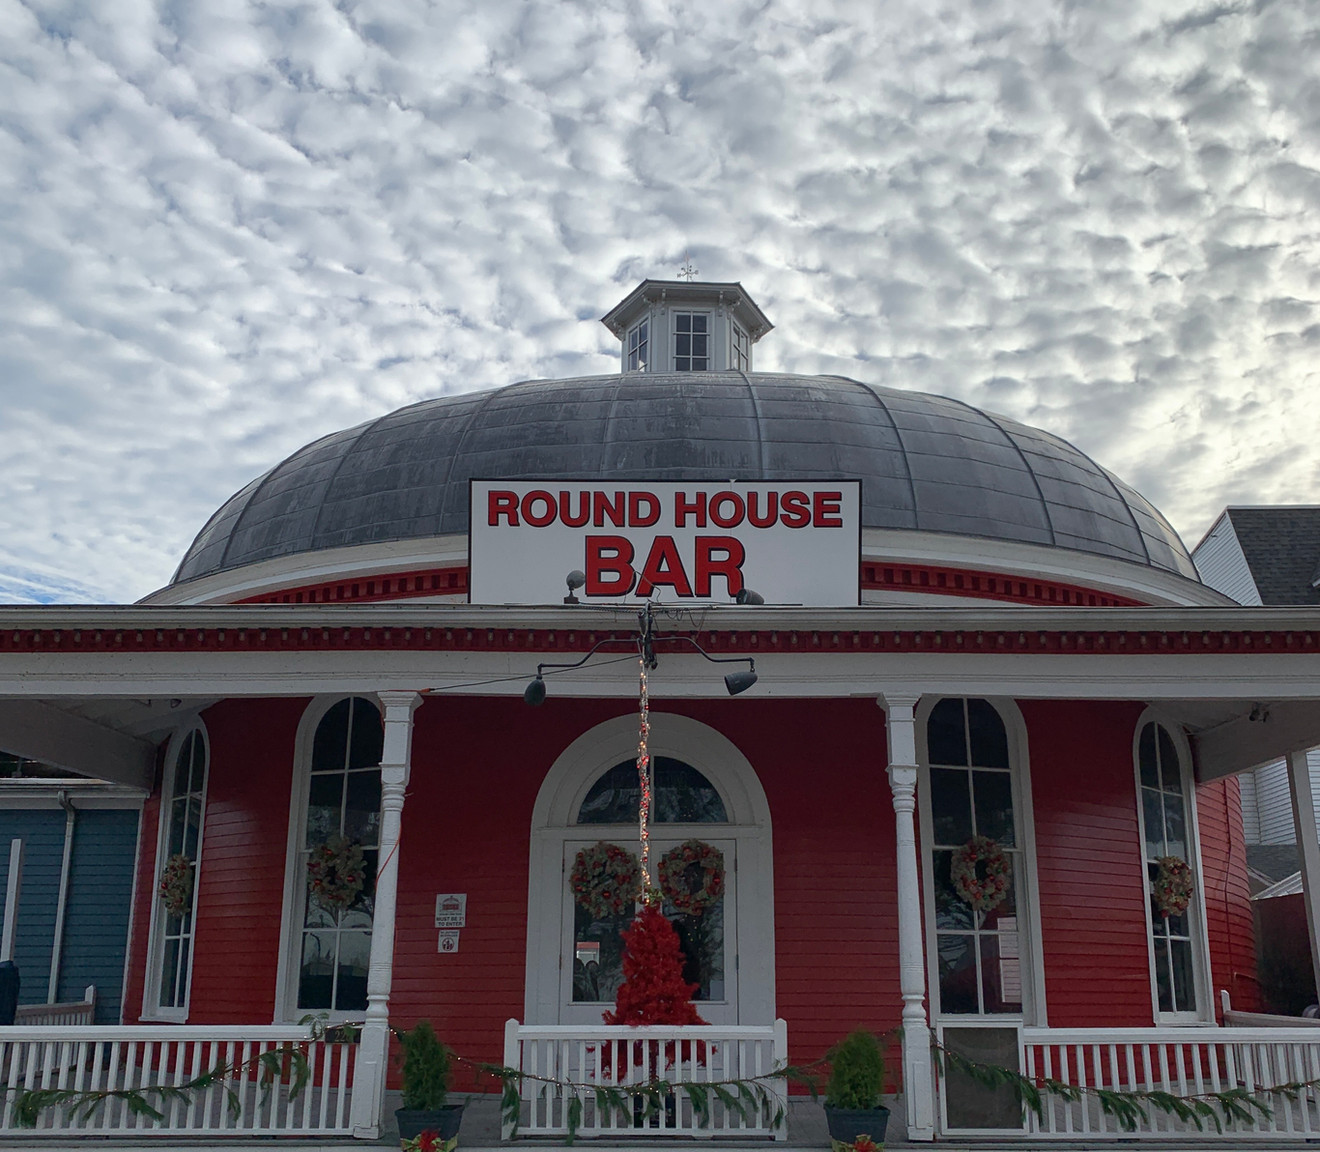 The Round House Bar